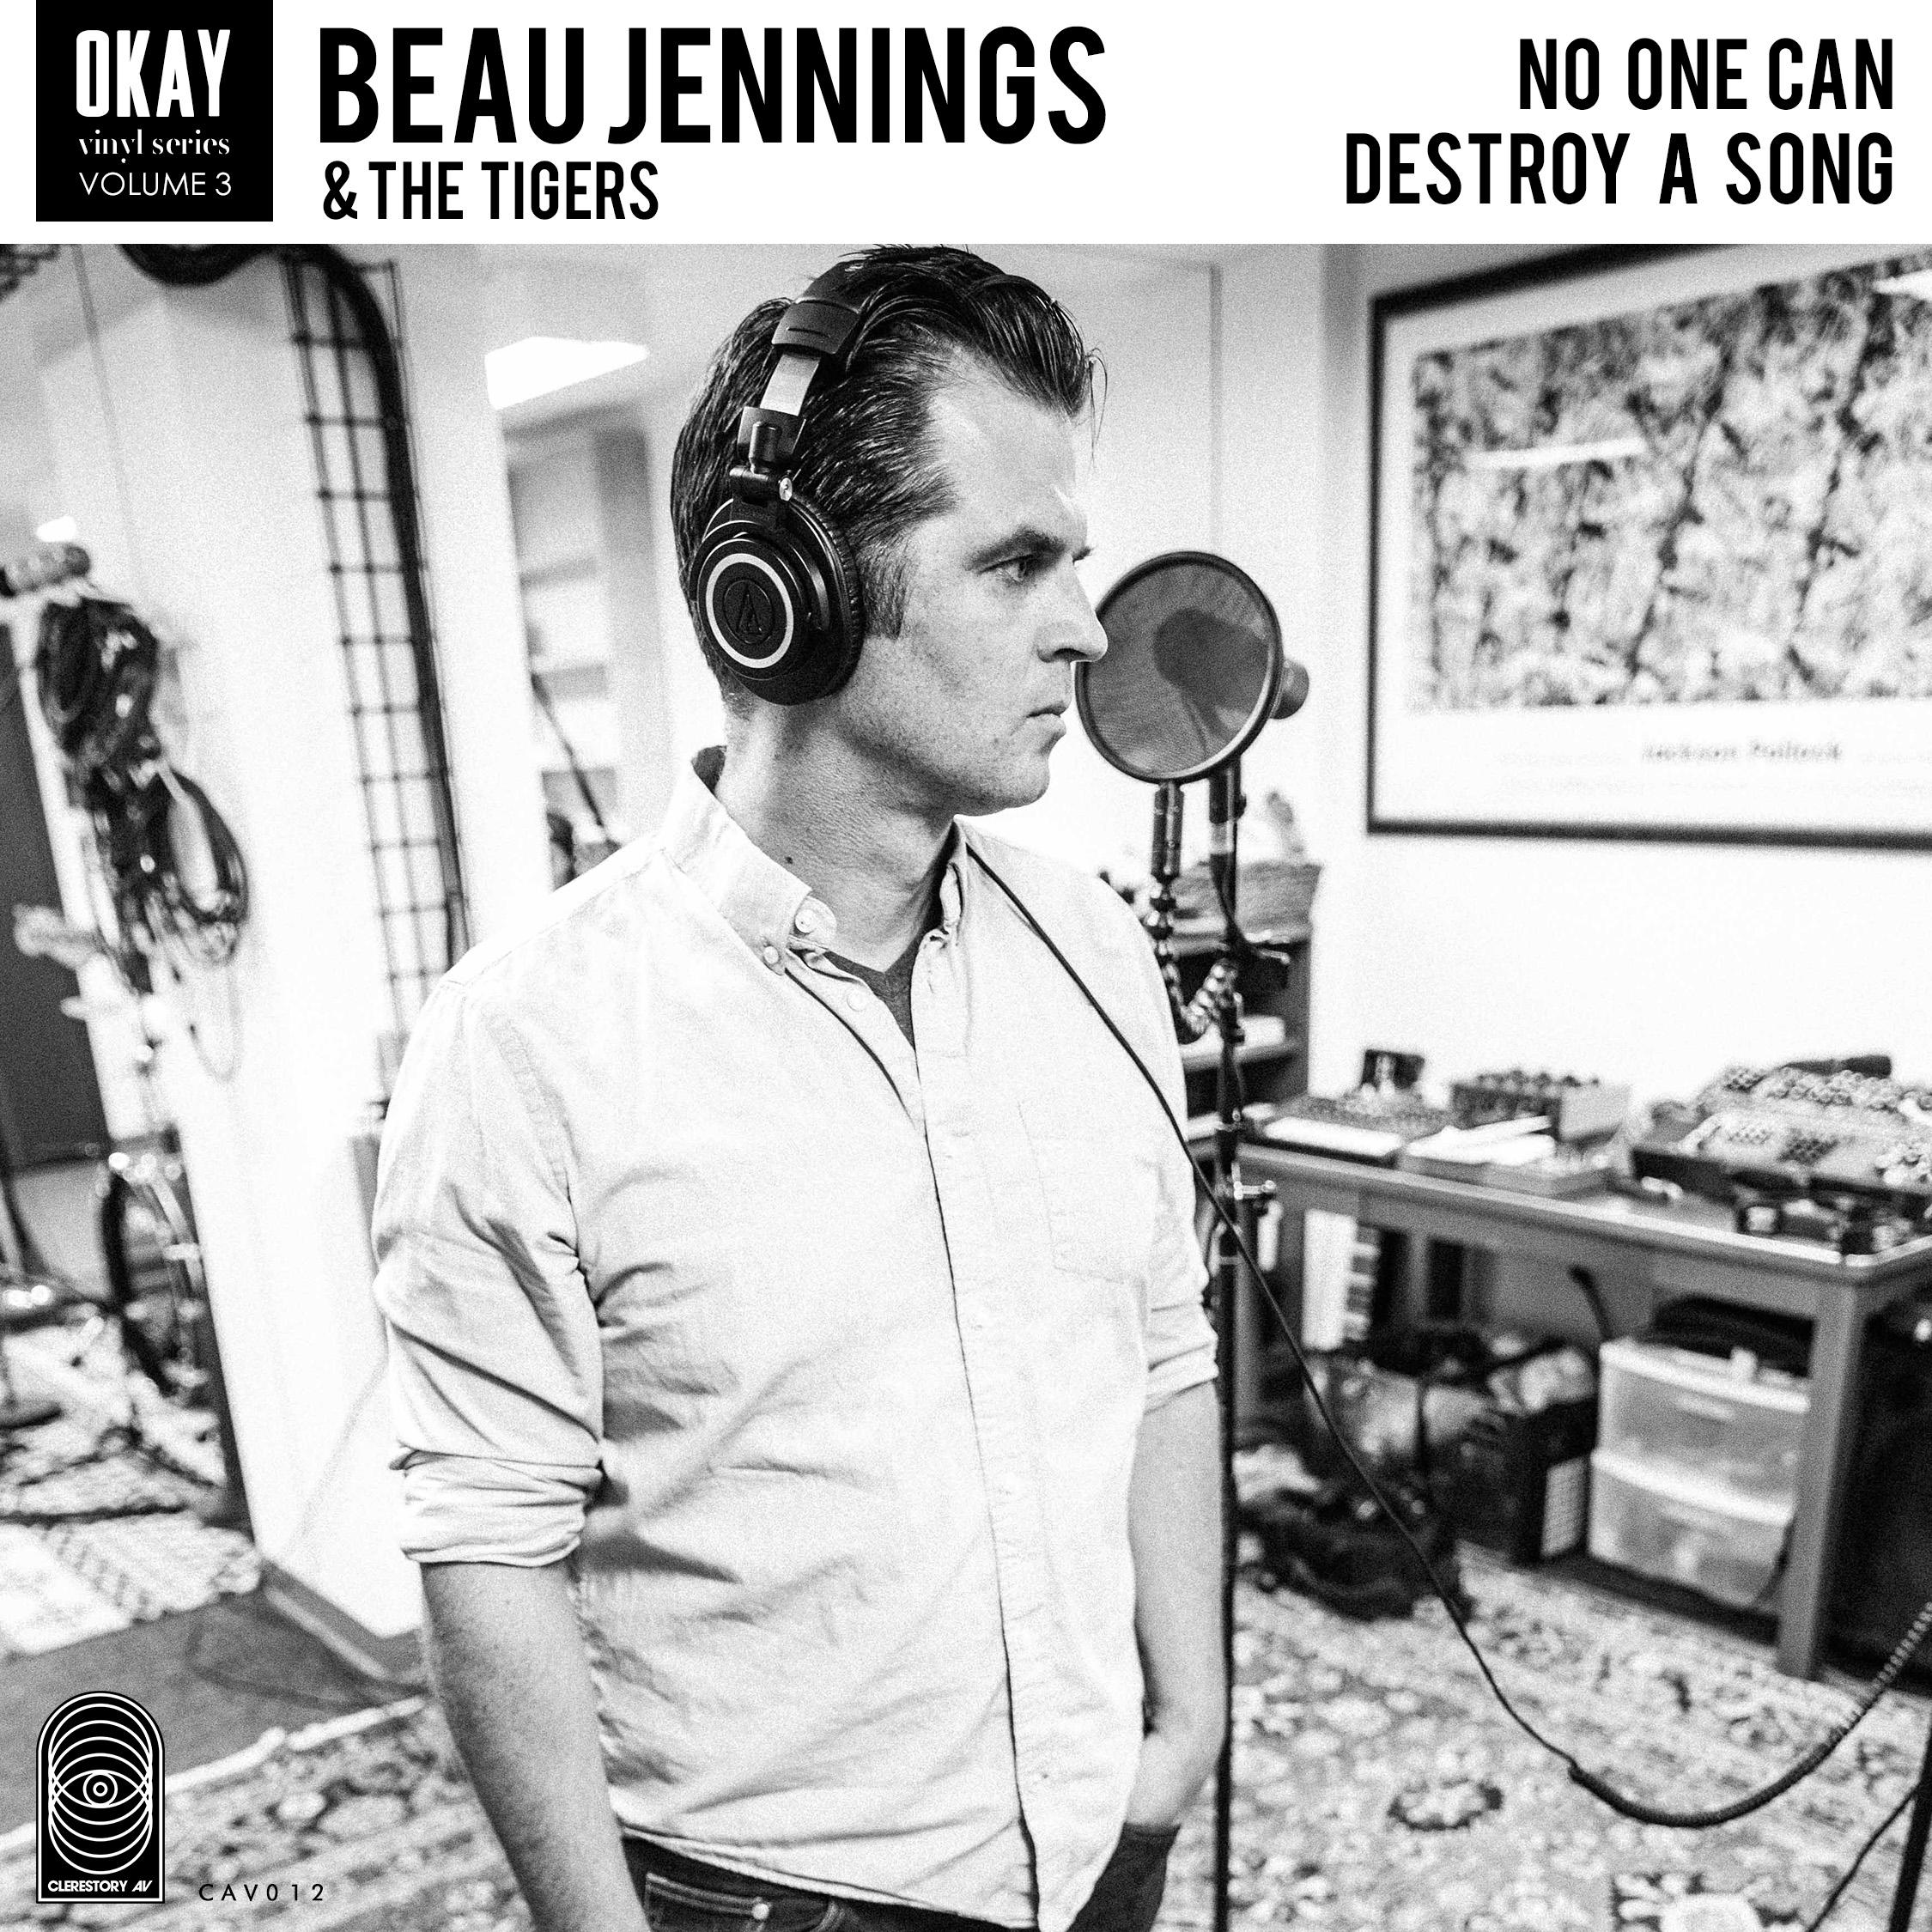 BEAU JENNINGS & THE TIGERS / OKAY Vinyl Series Vol. 3